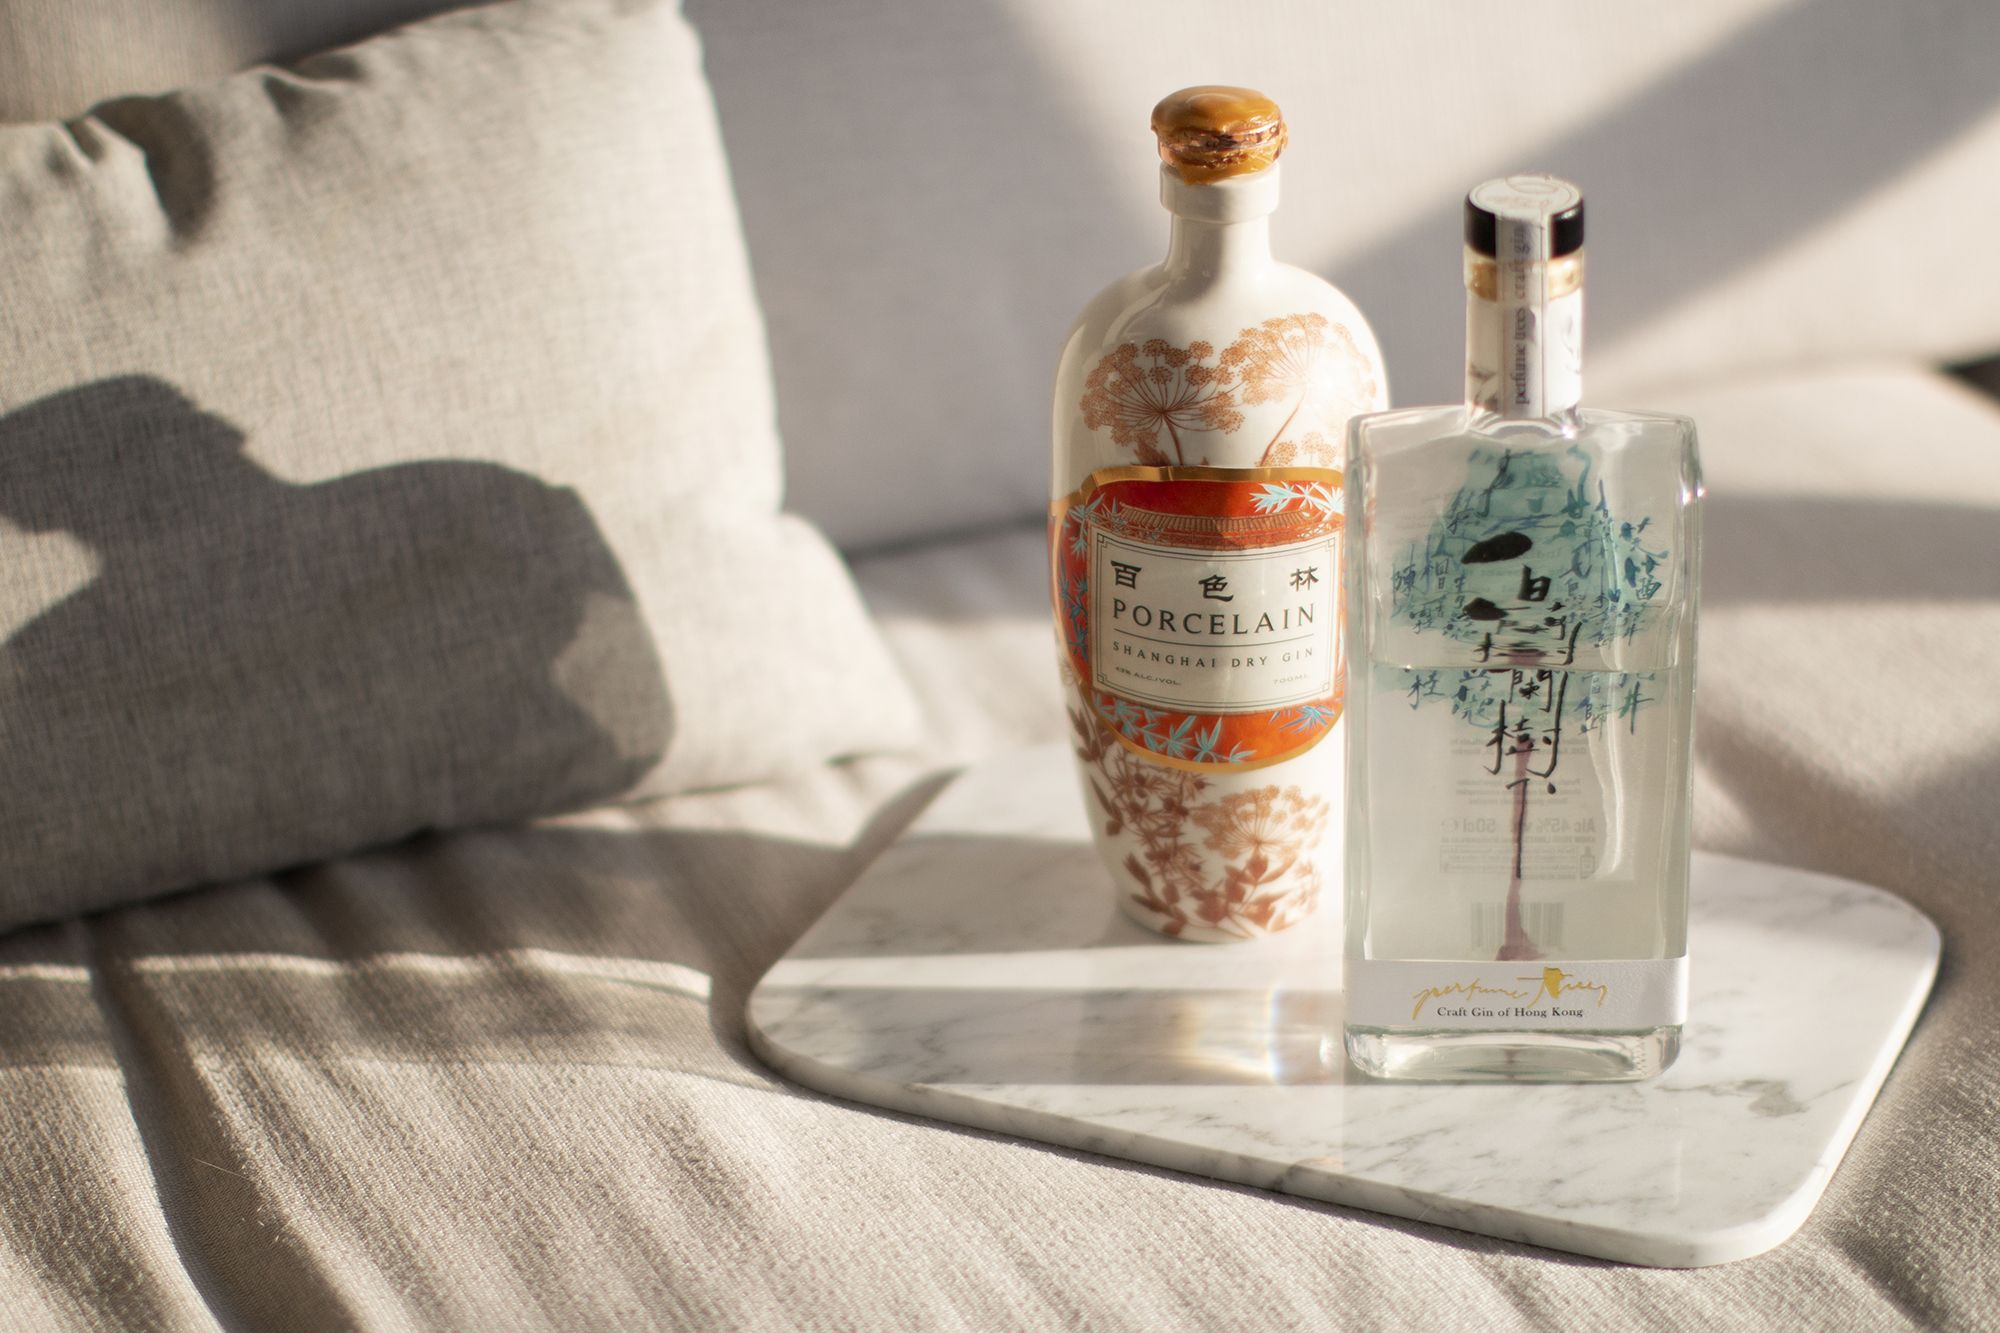 A Serious Drinker's Guide To Hong Kong Gin